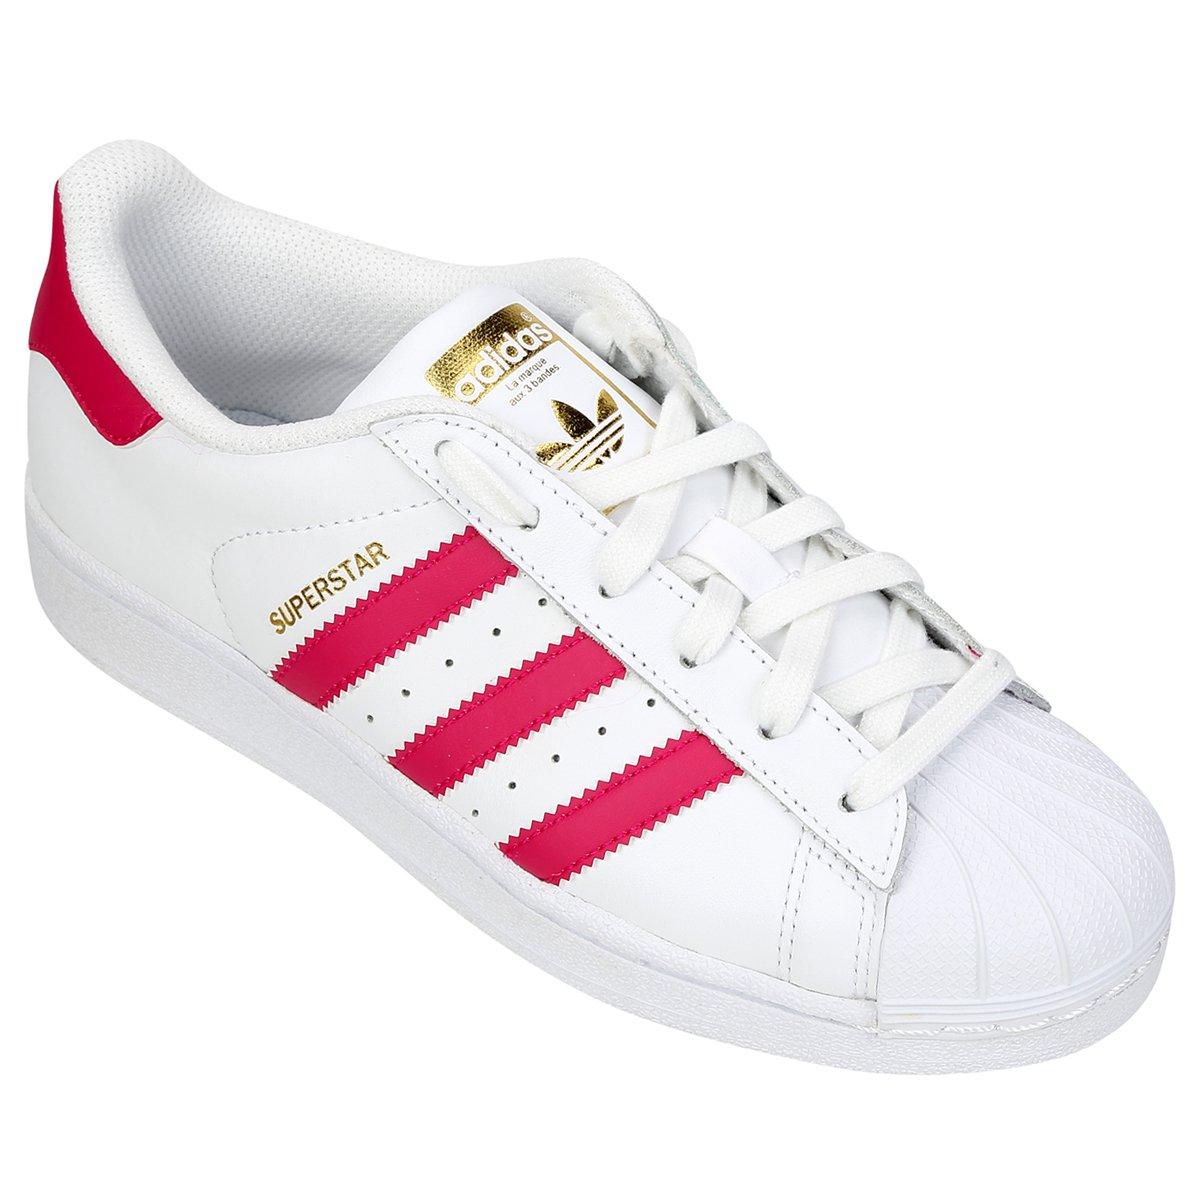 d1b1b23ee93 Tênis Adidas Superstar Foundation Infantil - Compre Agora